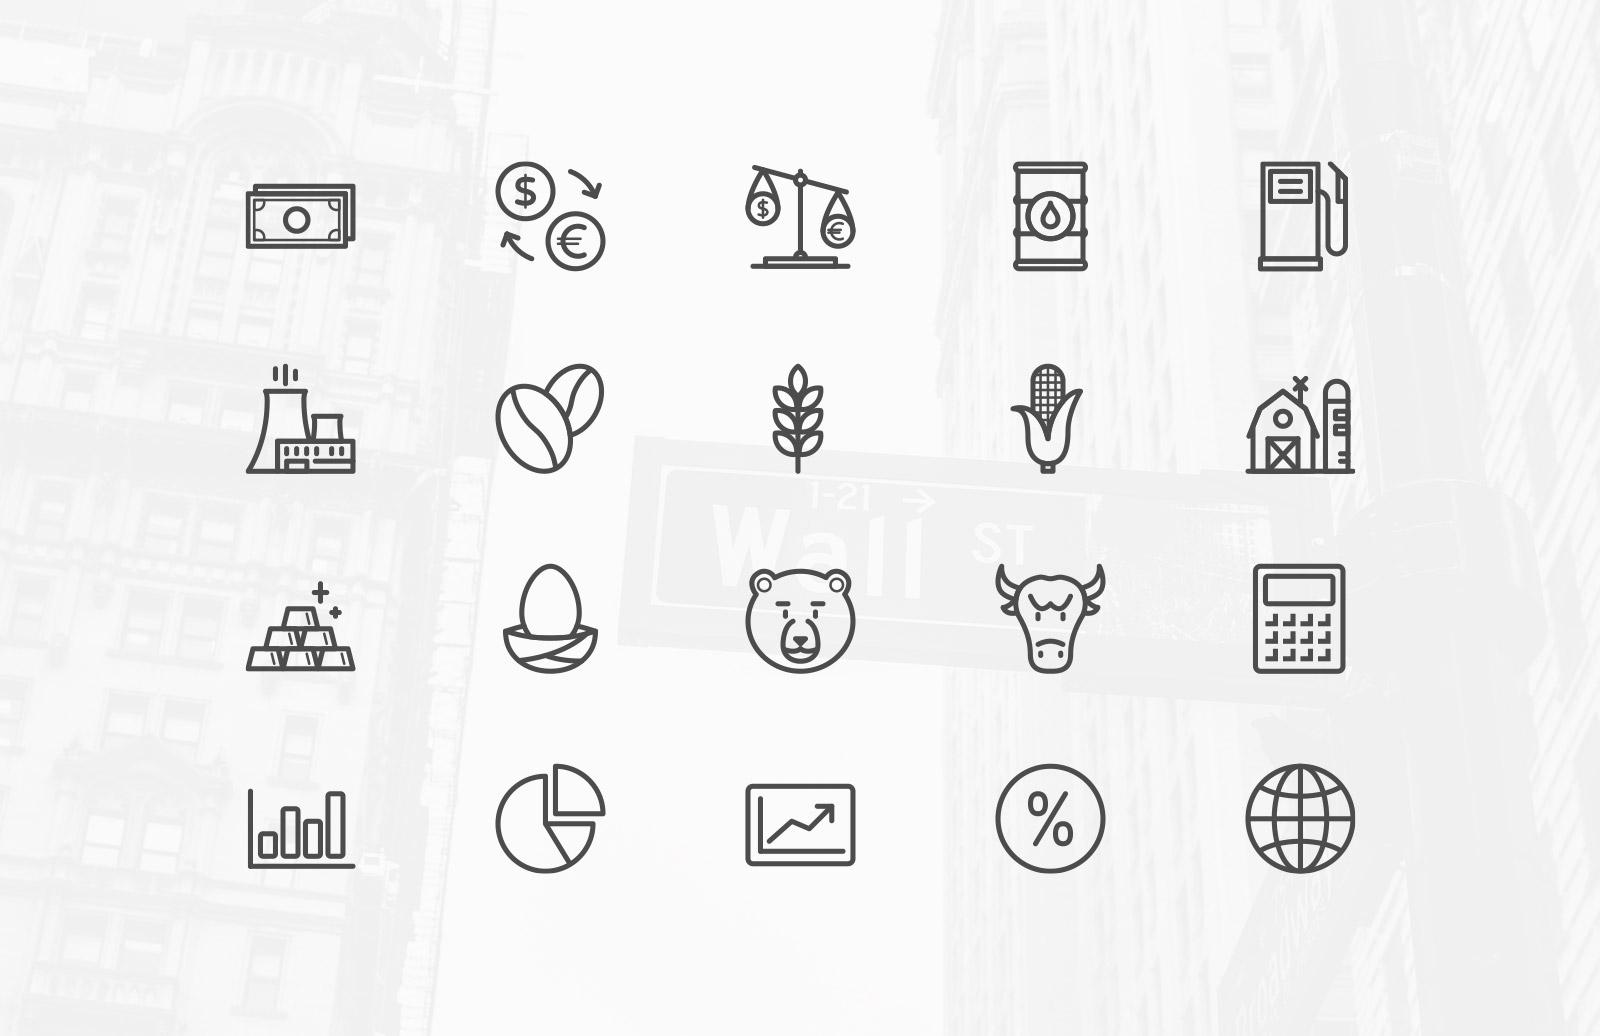 Stock Market & Commodity Icons 2